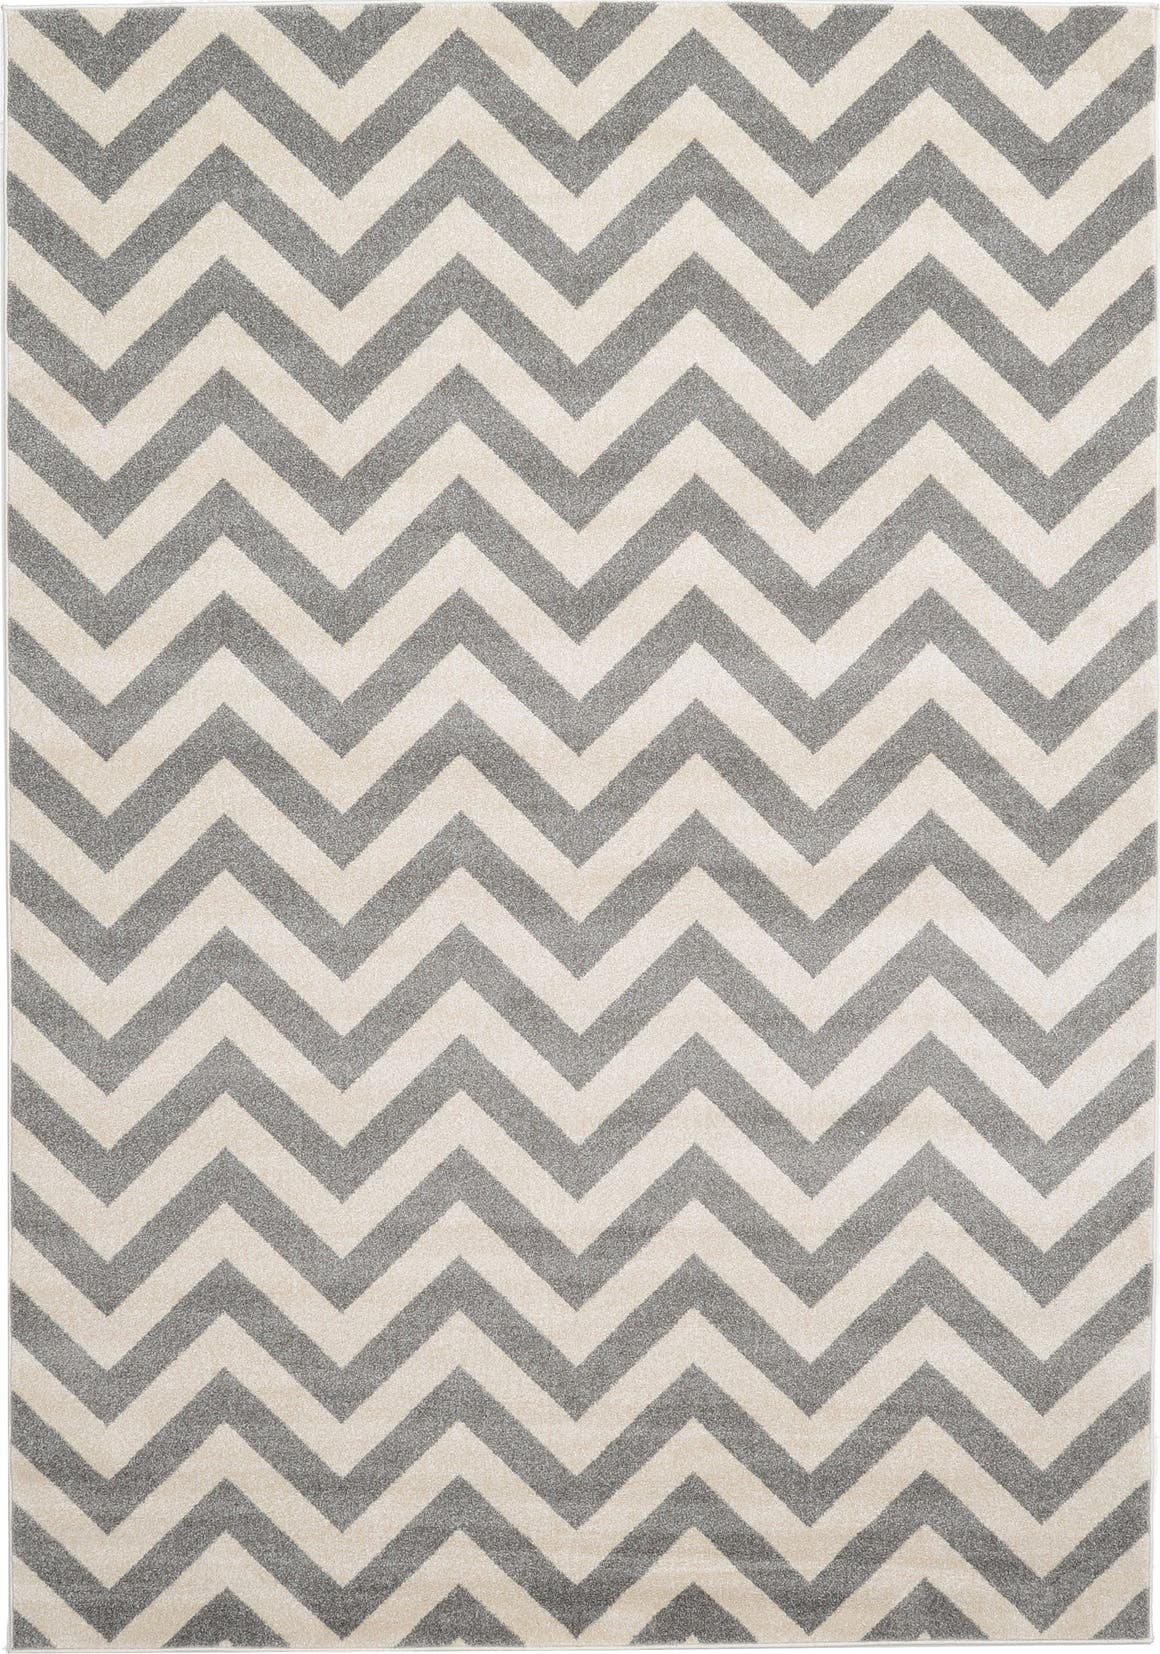 Gray 7' x 10' Chevron Rug | eSaleRugs